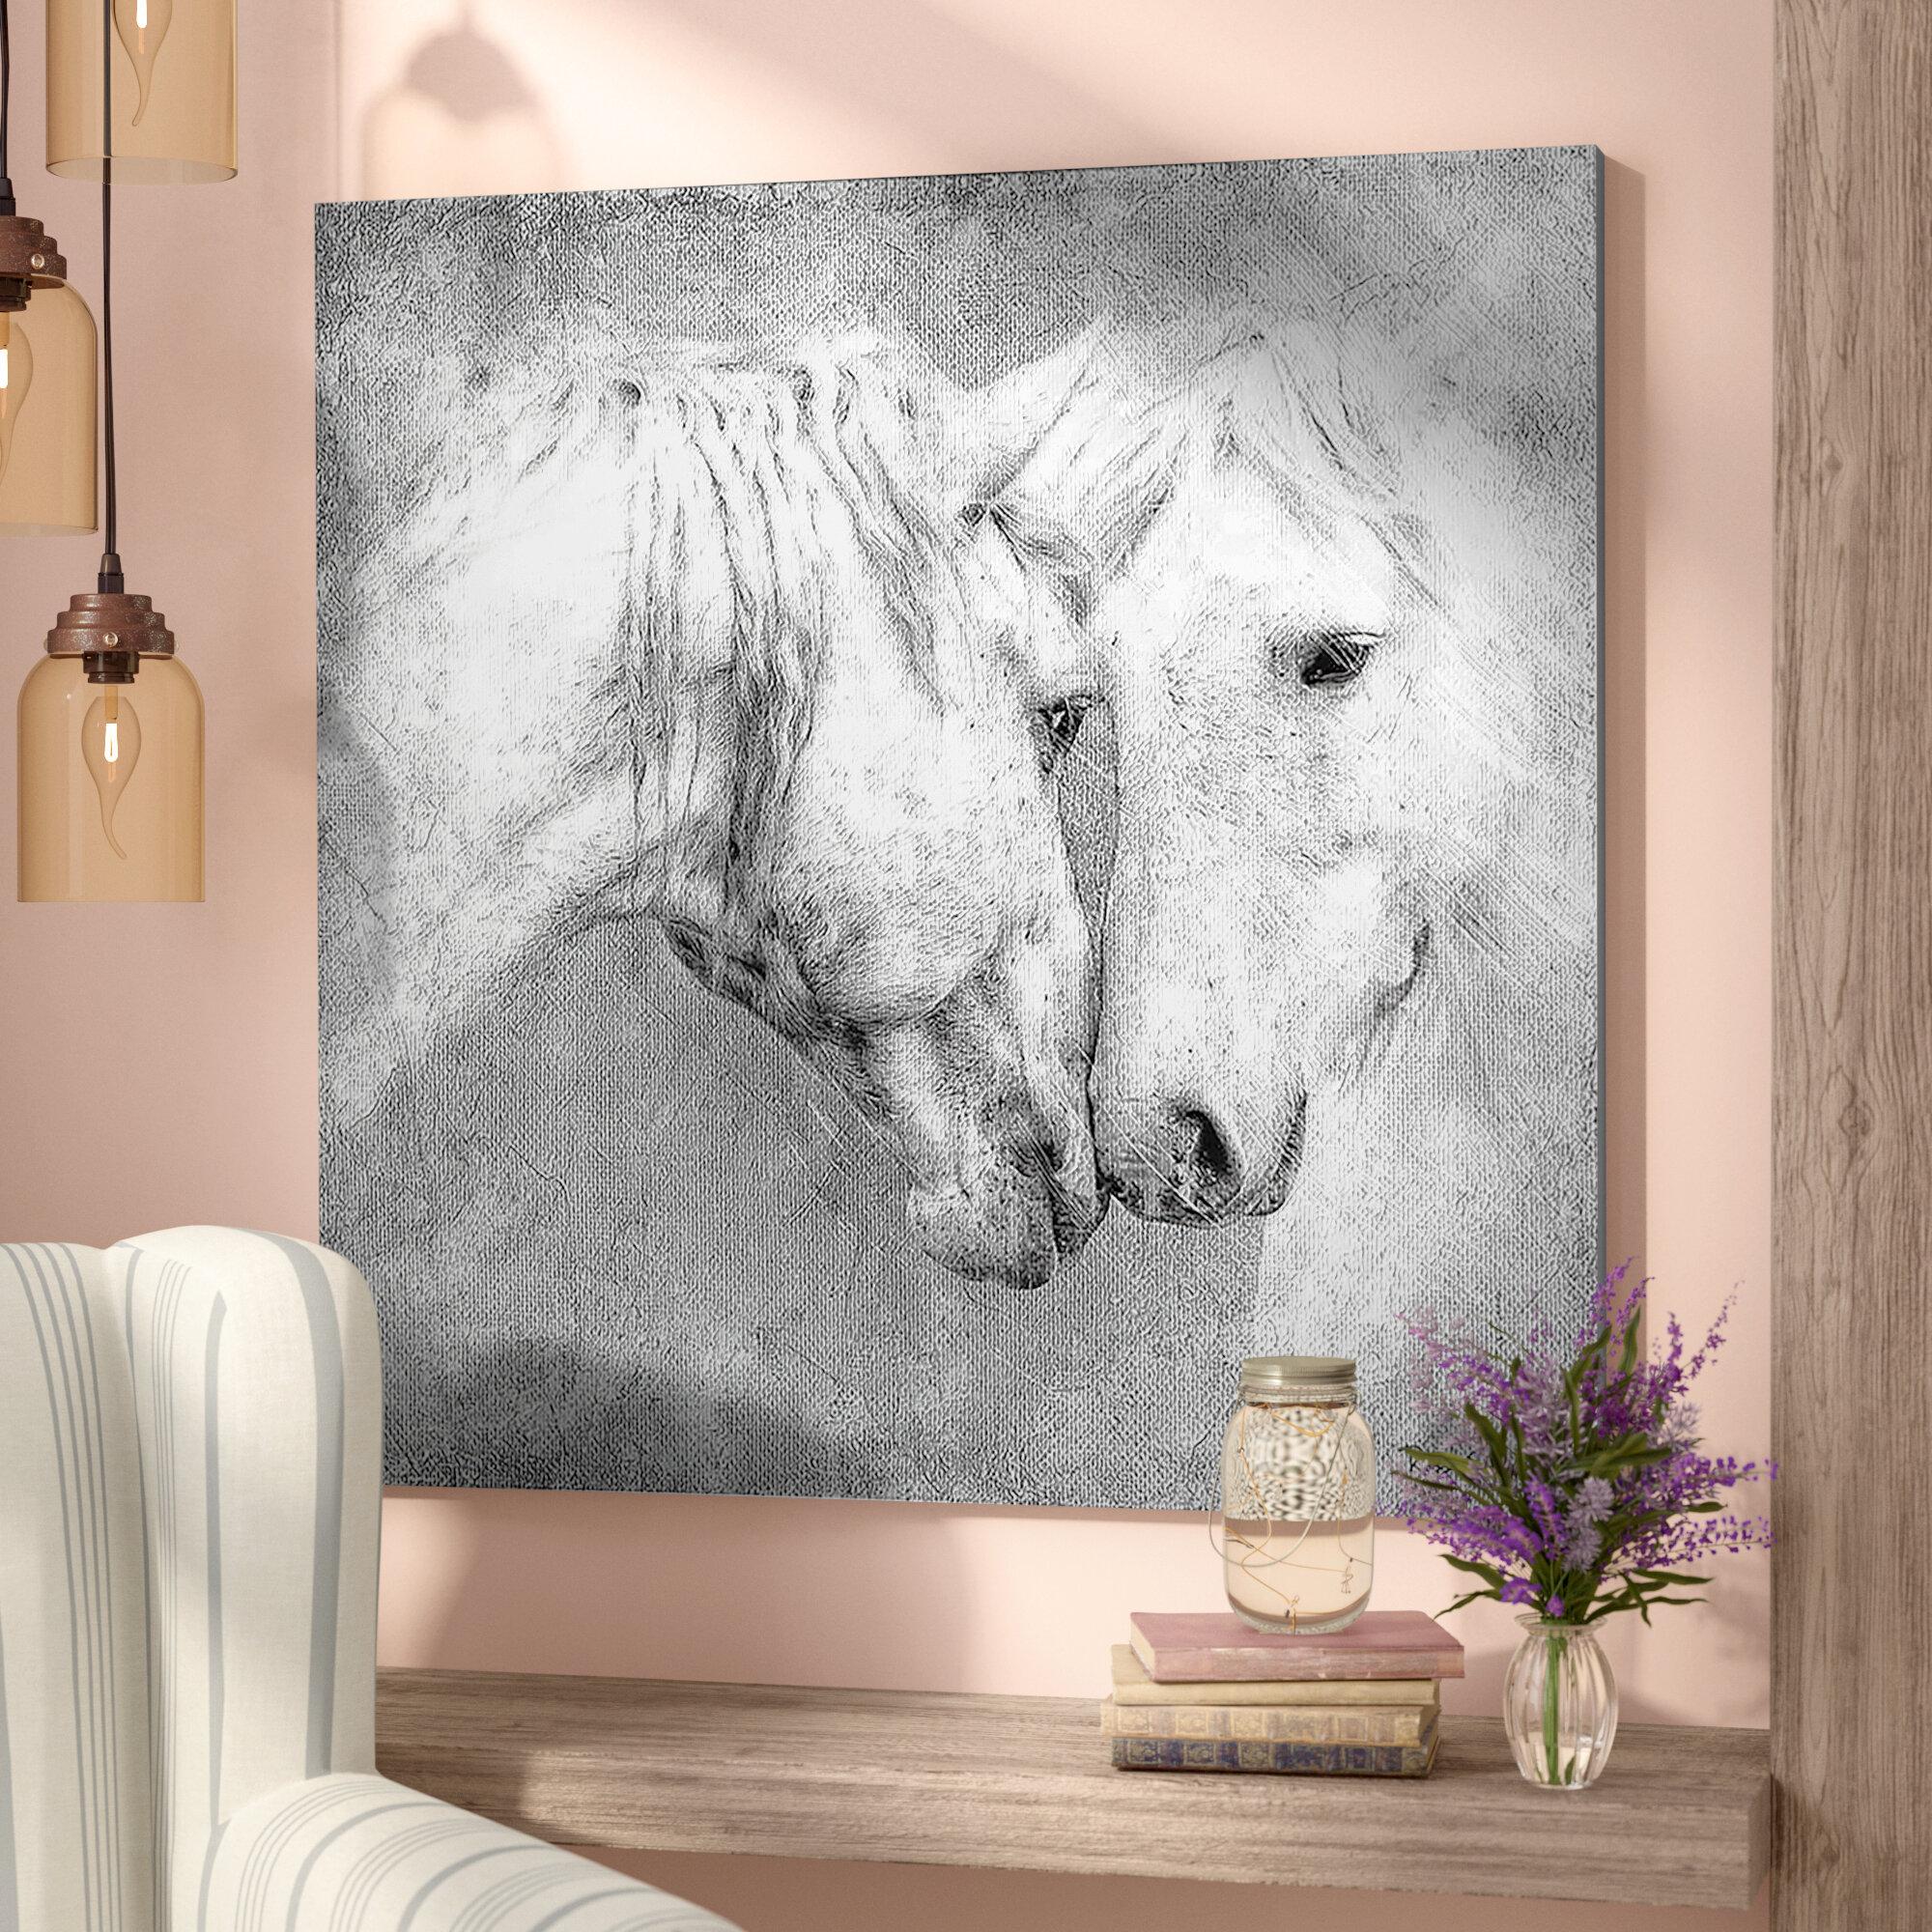 Metal Wall Art Large Original Shining Indoor Outdoor Horse Decor by Master Cut